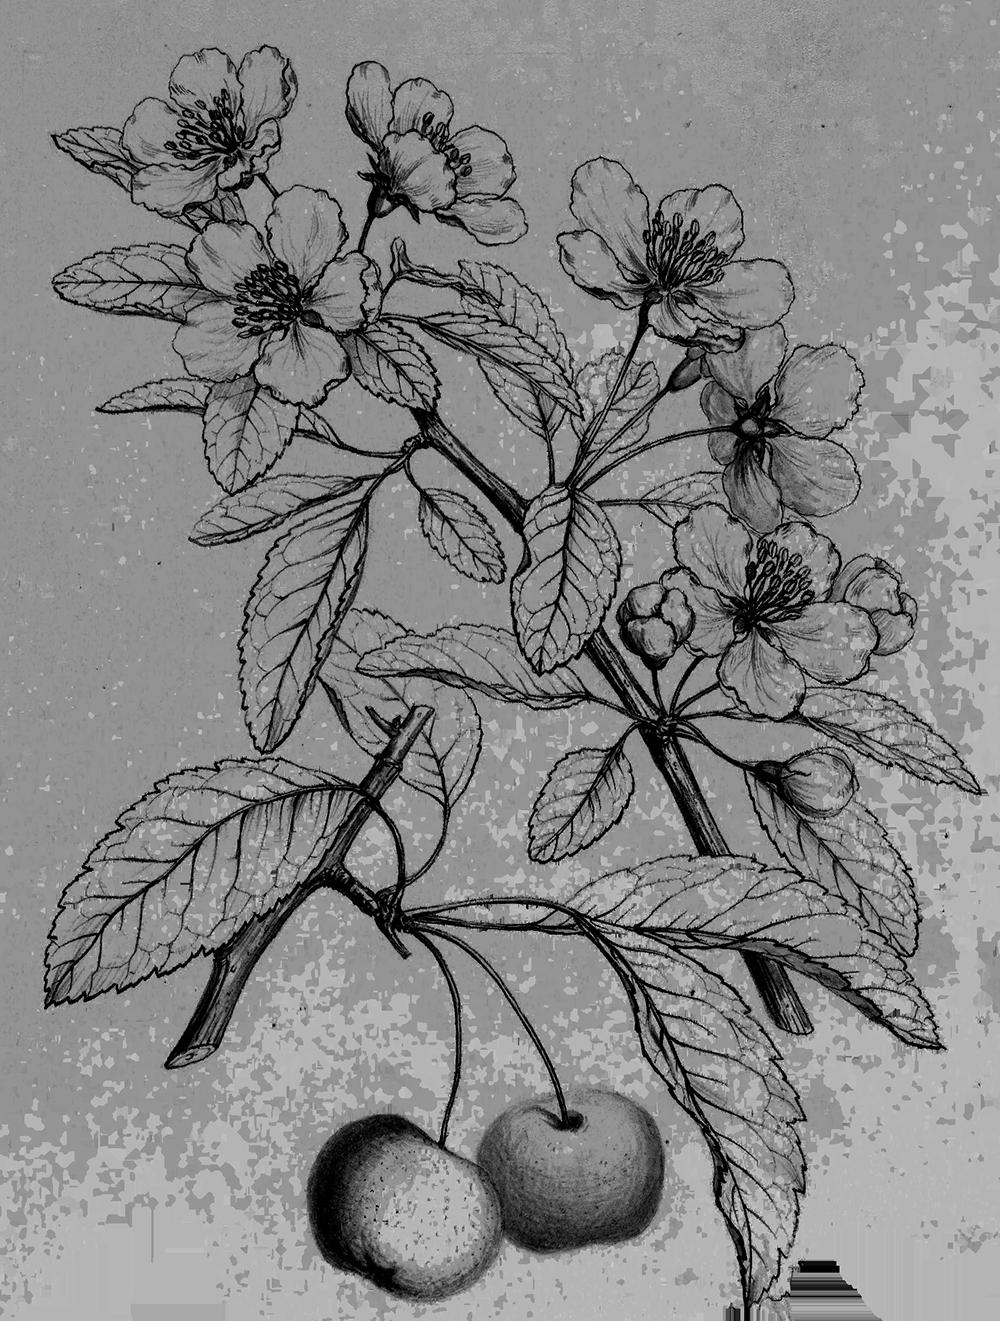 Crabapple illustration by Charles Faxon